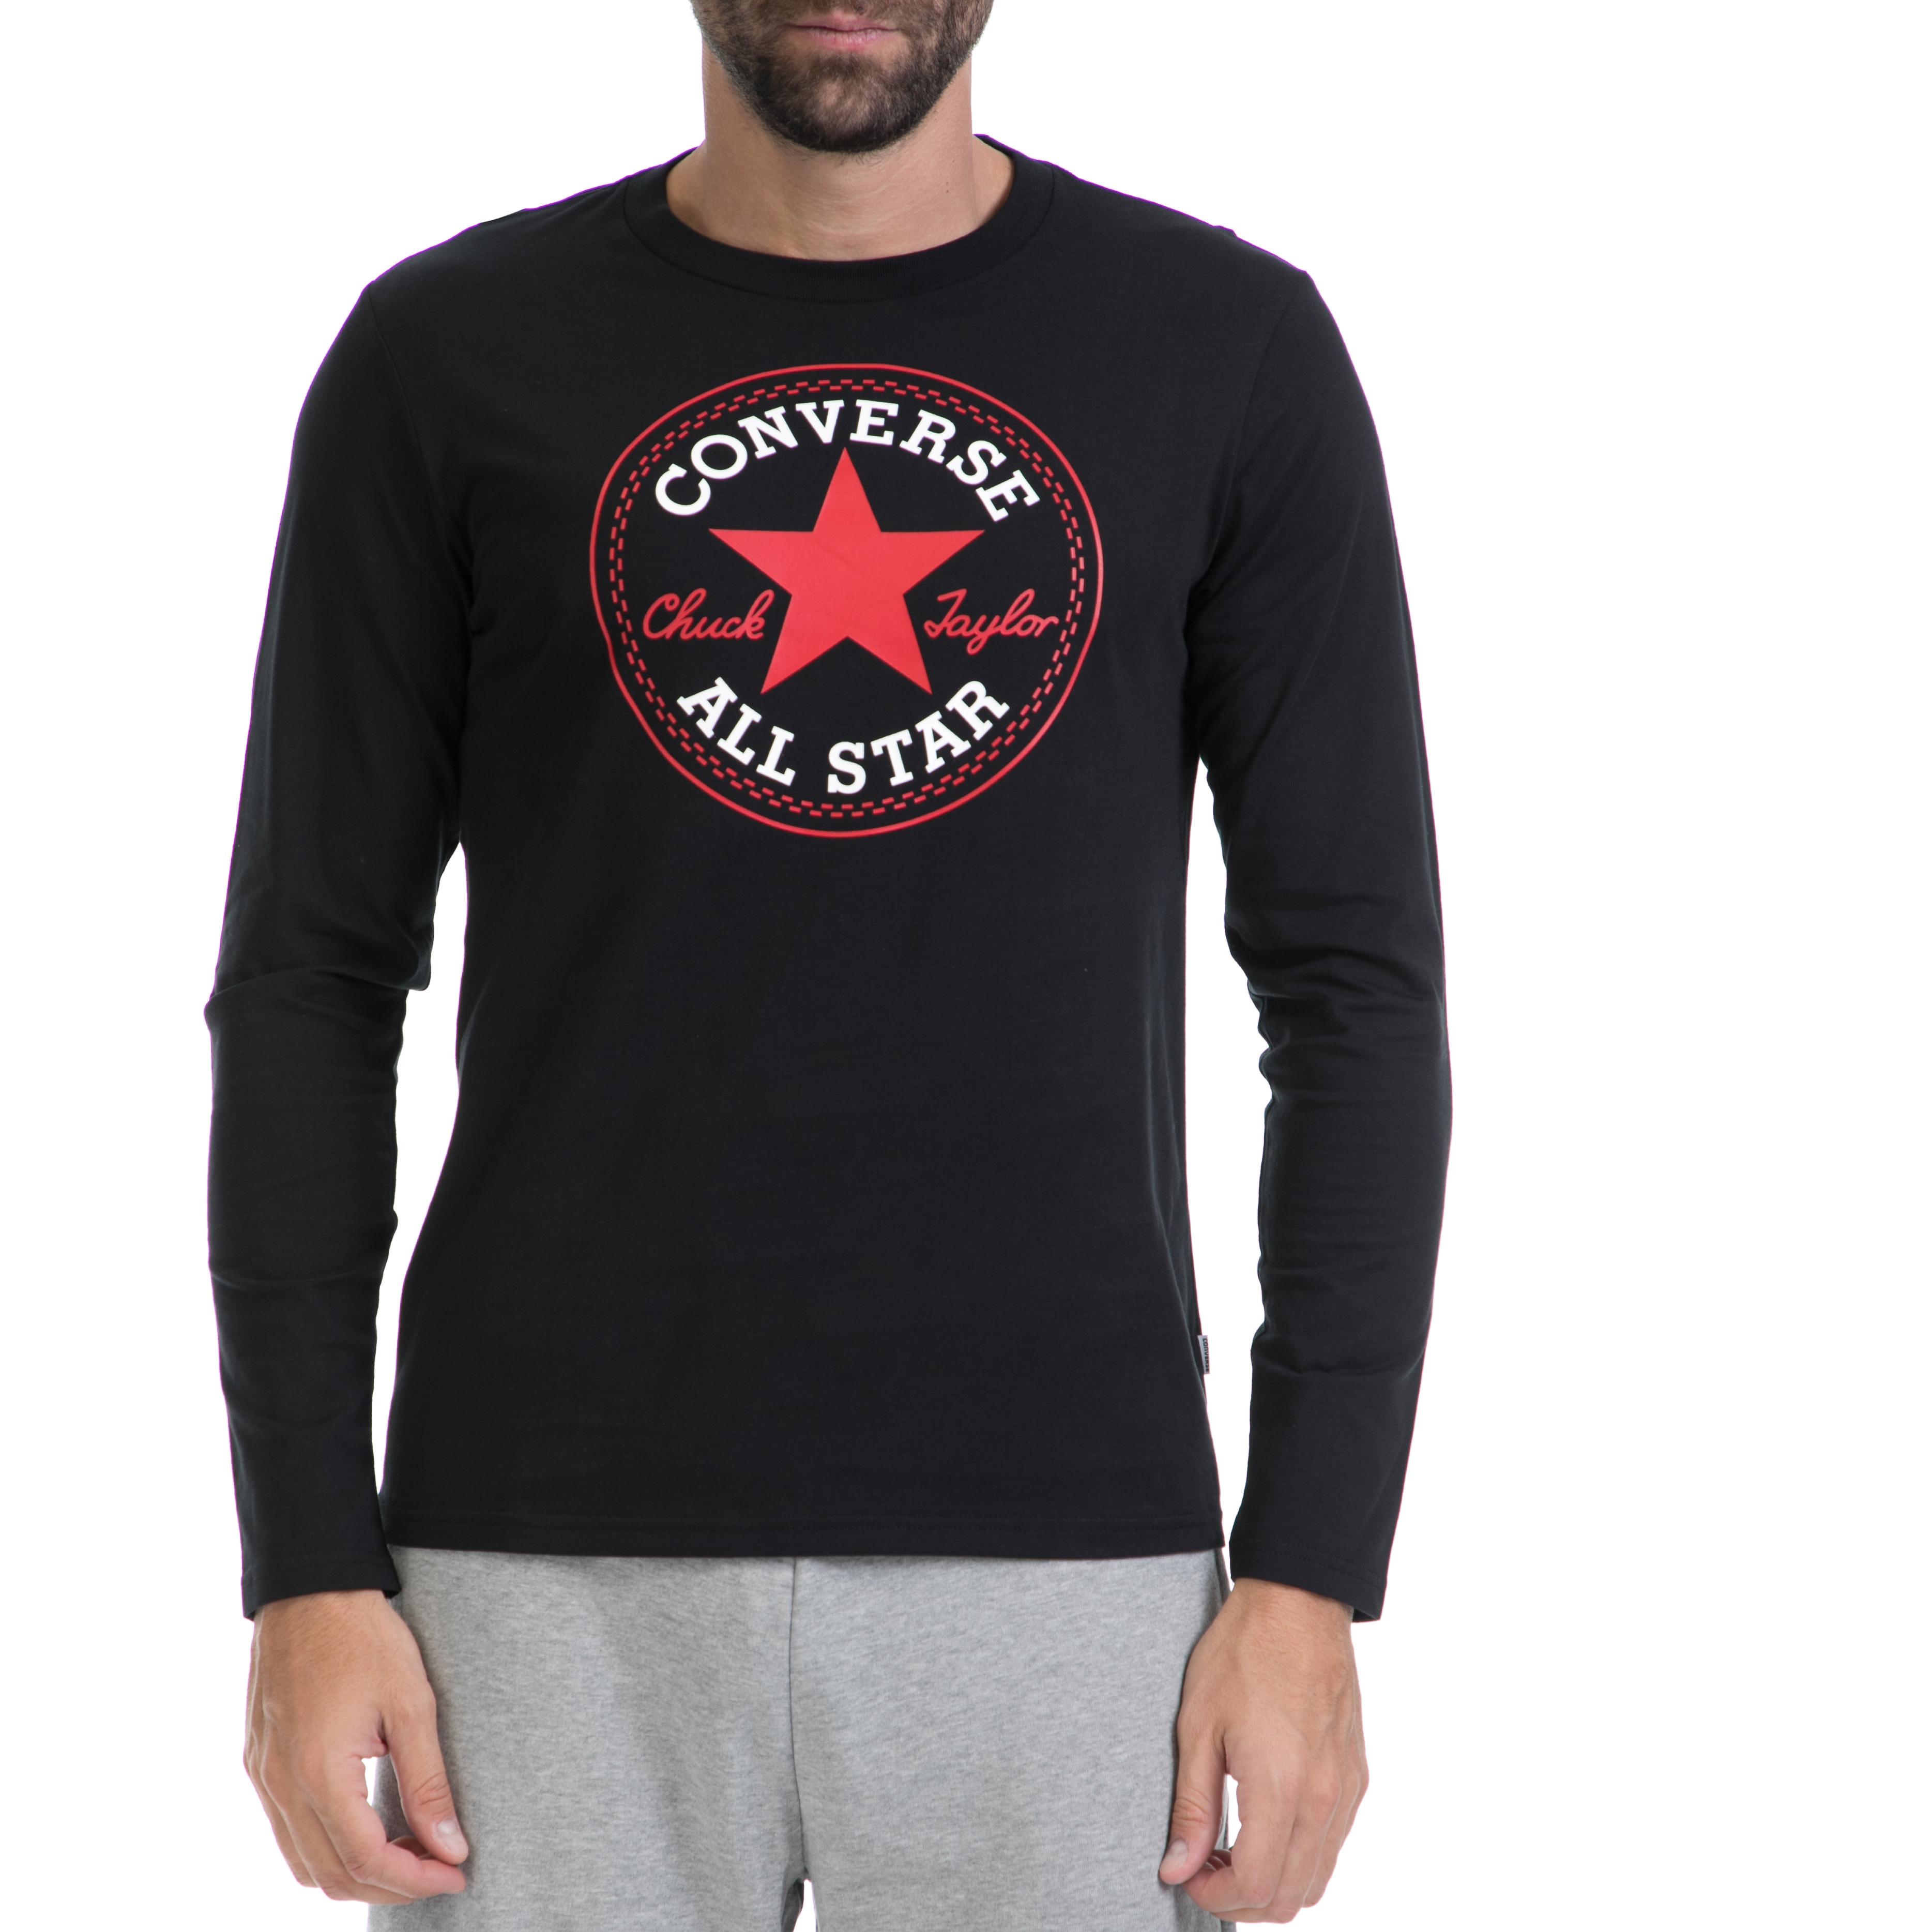 CONVERSE - Αντρική μπλούζα CONVERSE μαύρη ανδρικά ρούχα αθλητικά φούτερ μακρυμάνικα